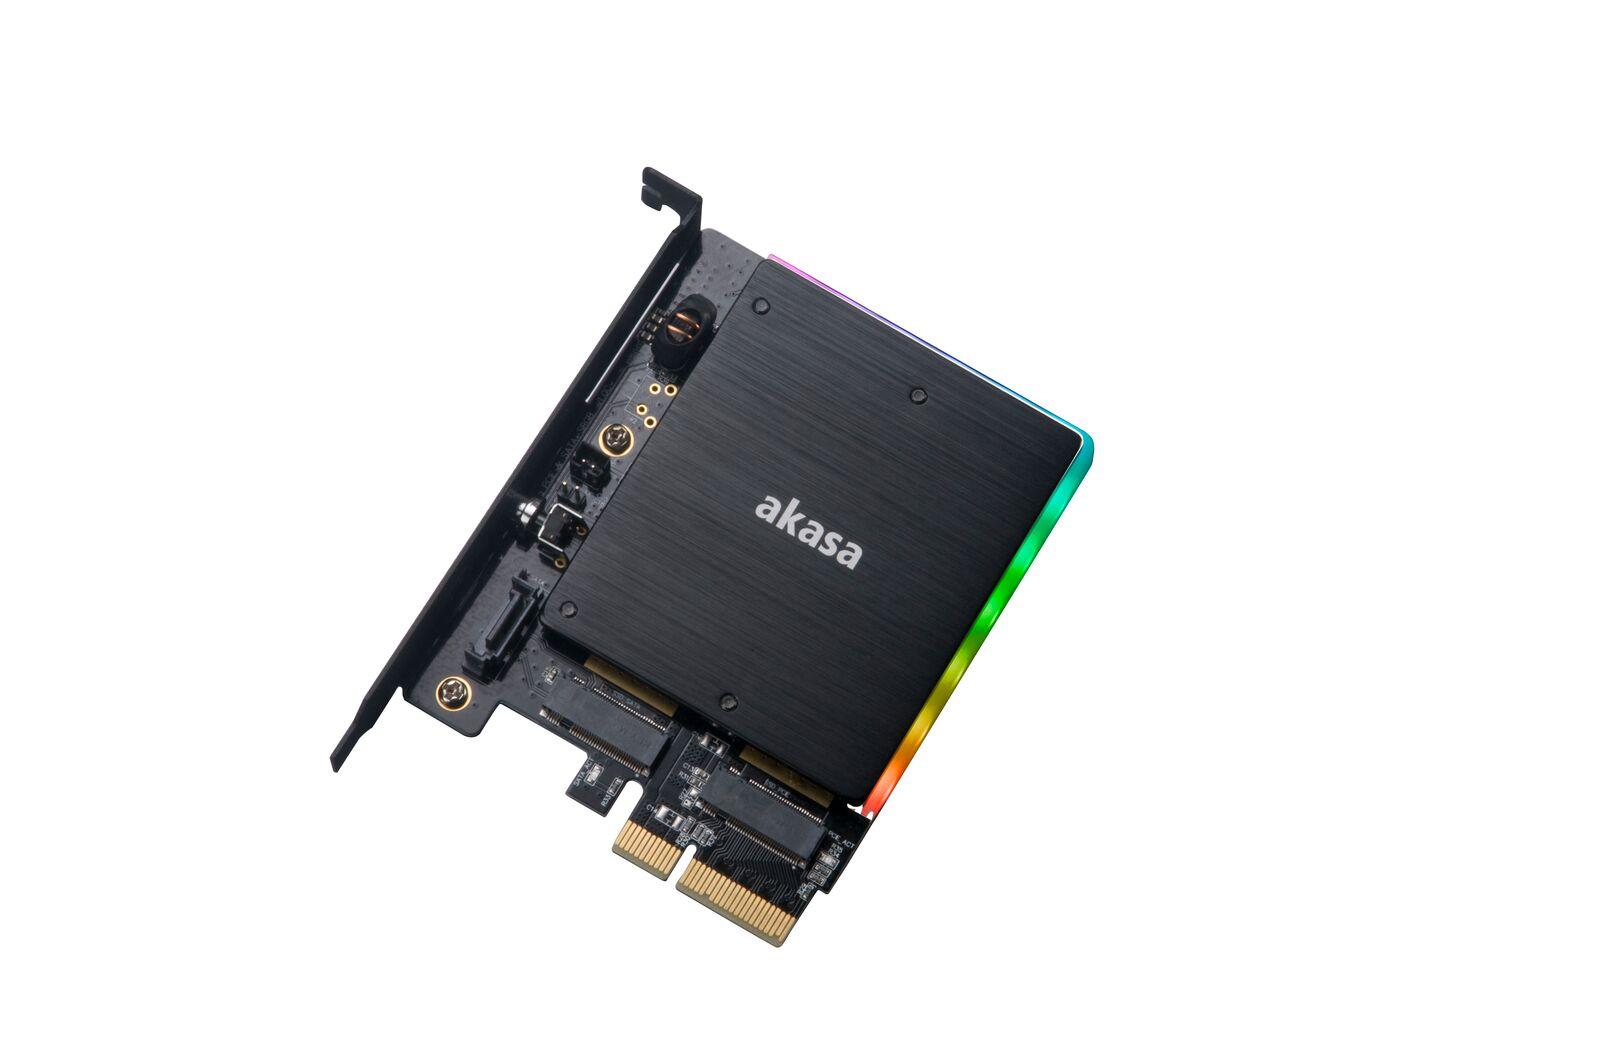 Akasa M.2 PCIe and M.2 SATA SSD adapter card with RGB LED light and heatsink